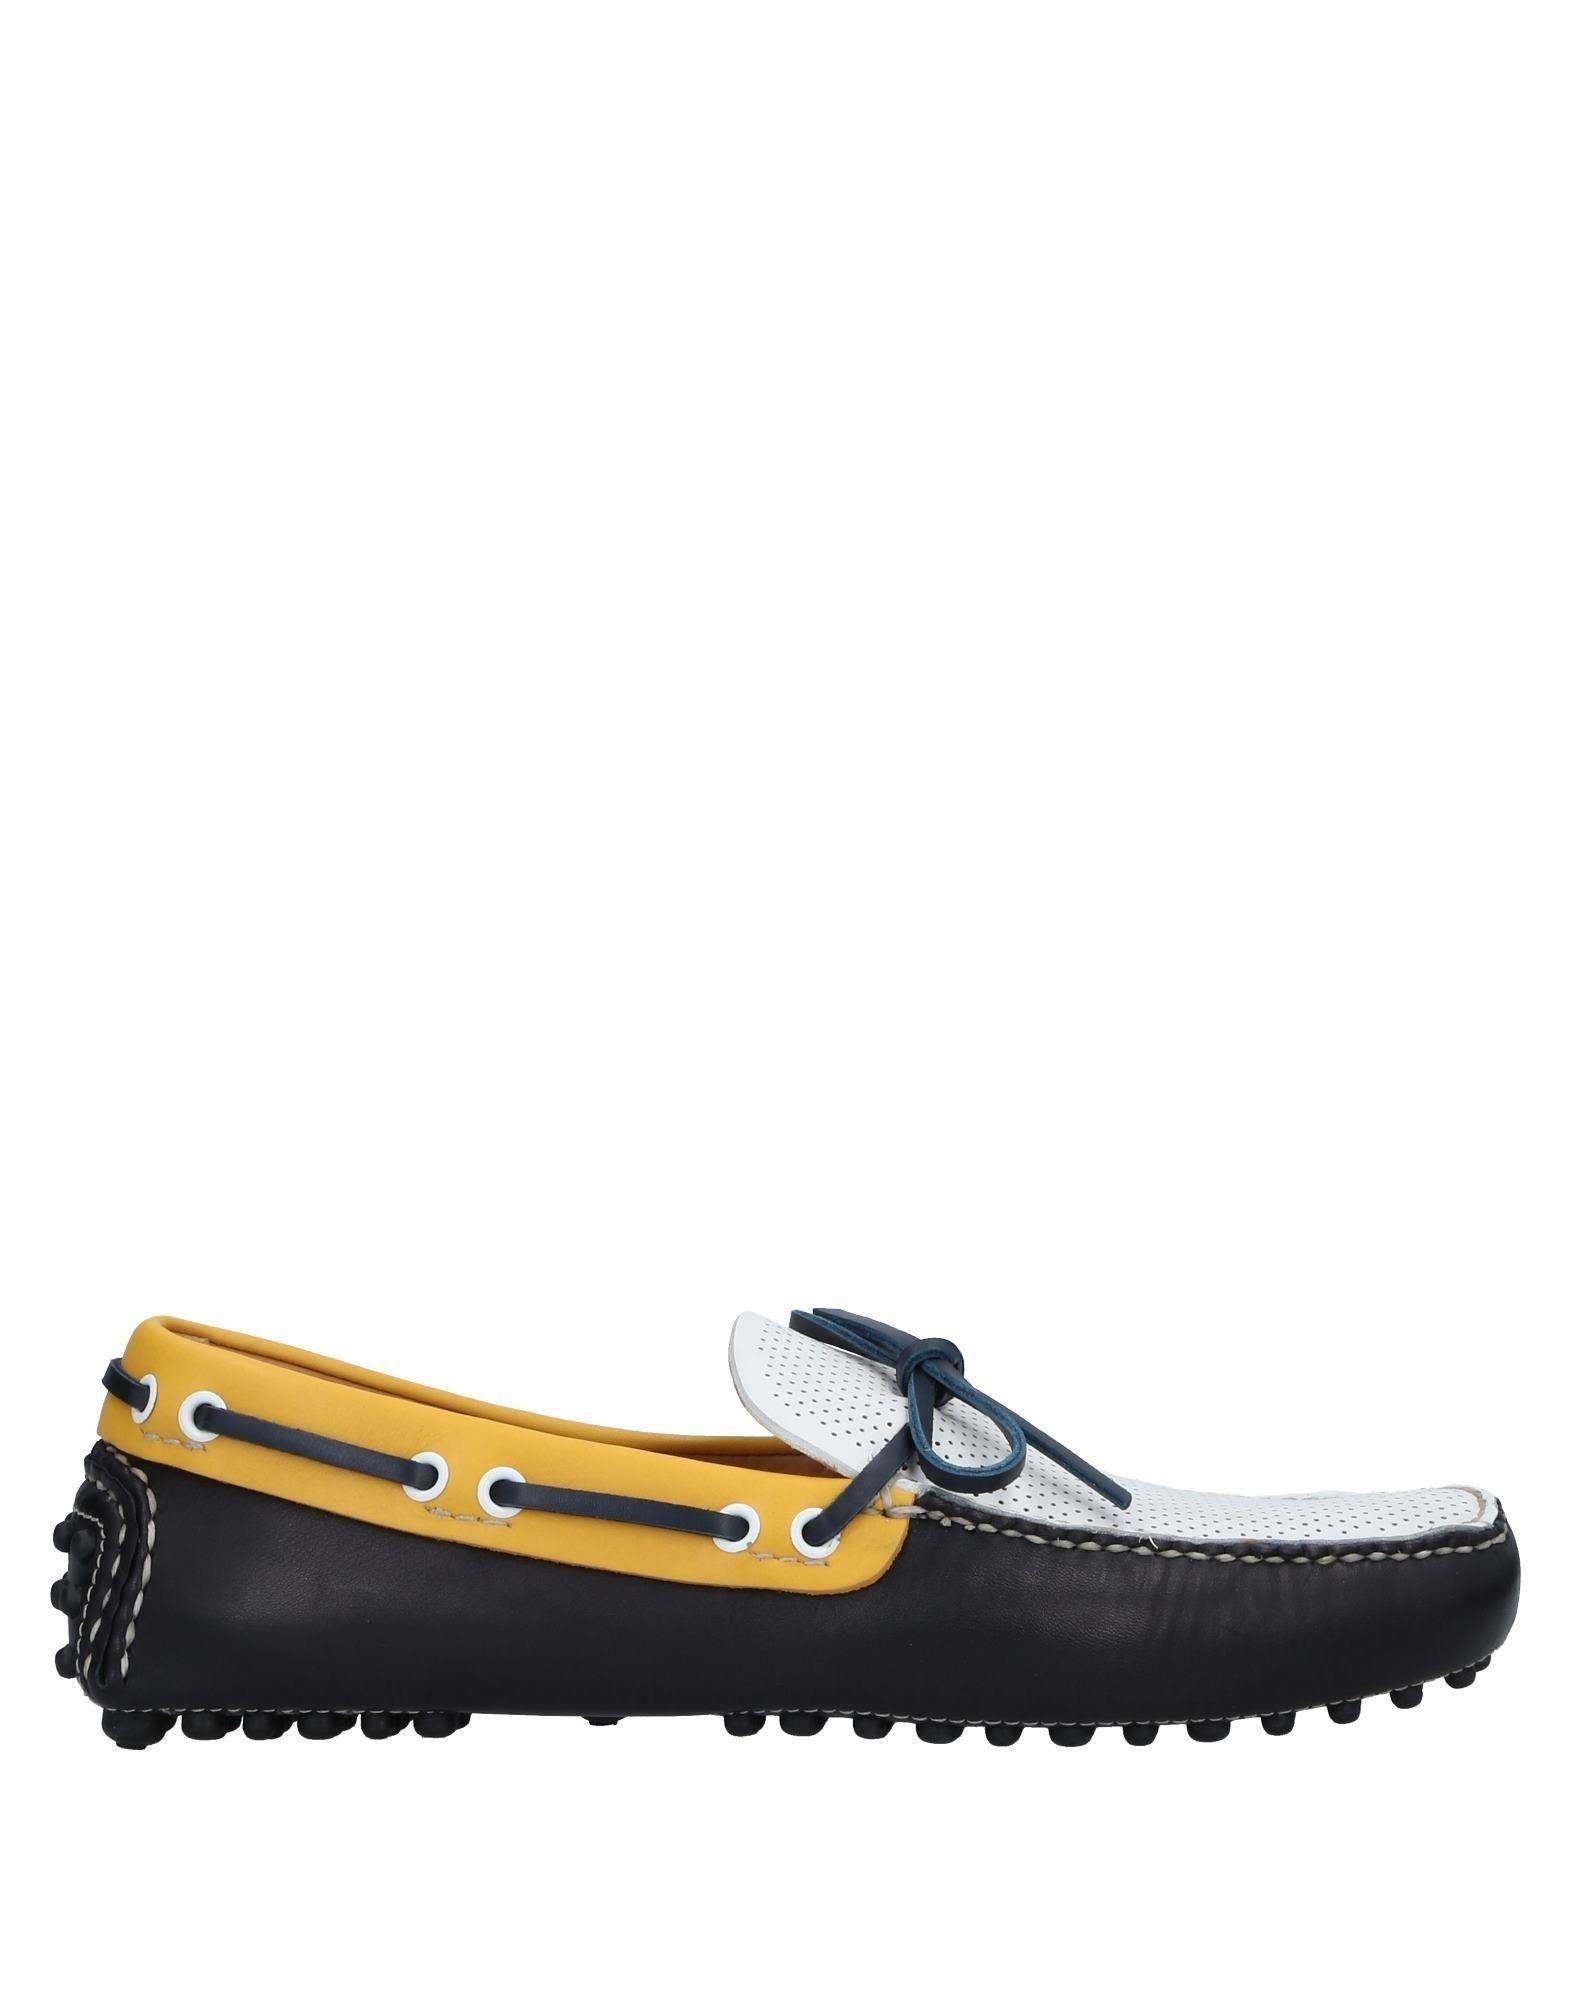 Carshoe Mokassins Herren  11526465RL Gute Qualität beliebte Schuhe